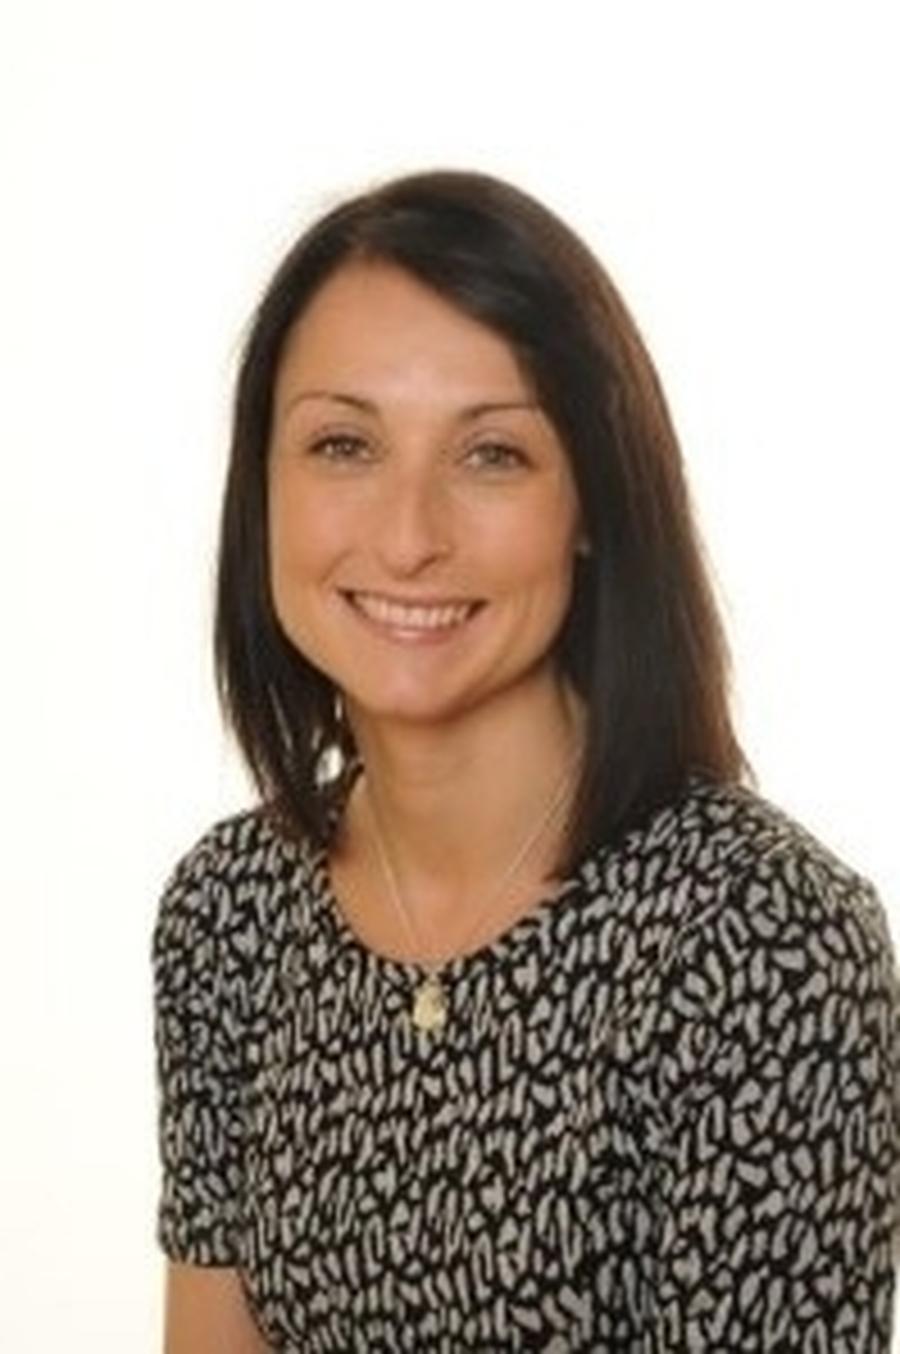 Mrs Kelly Foxton